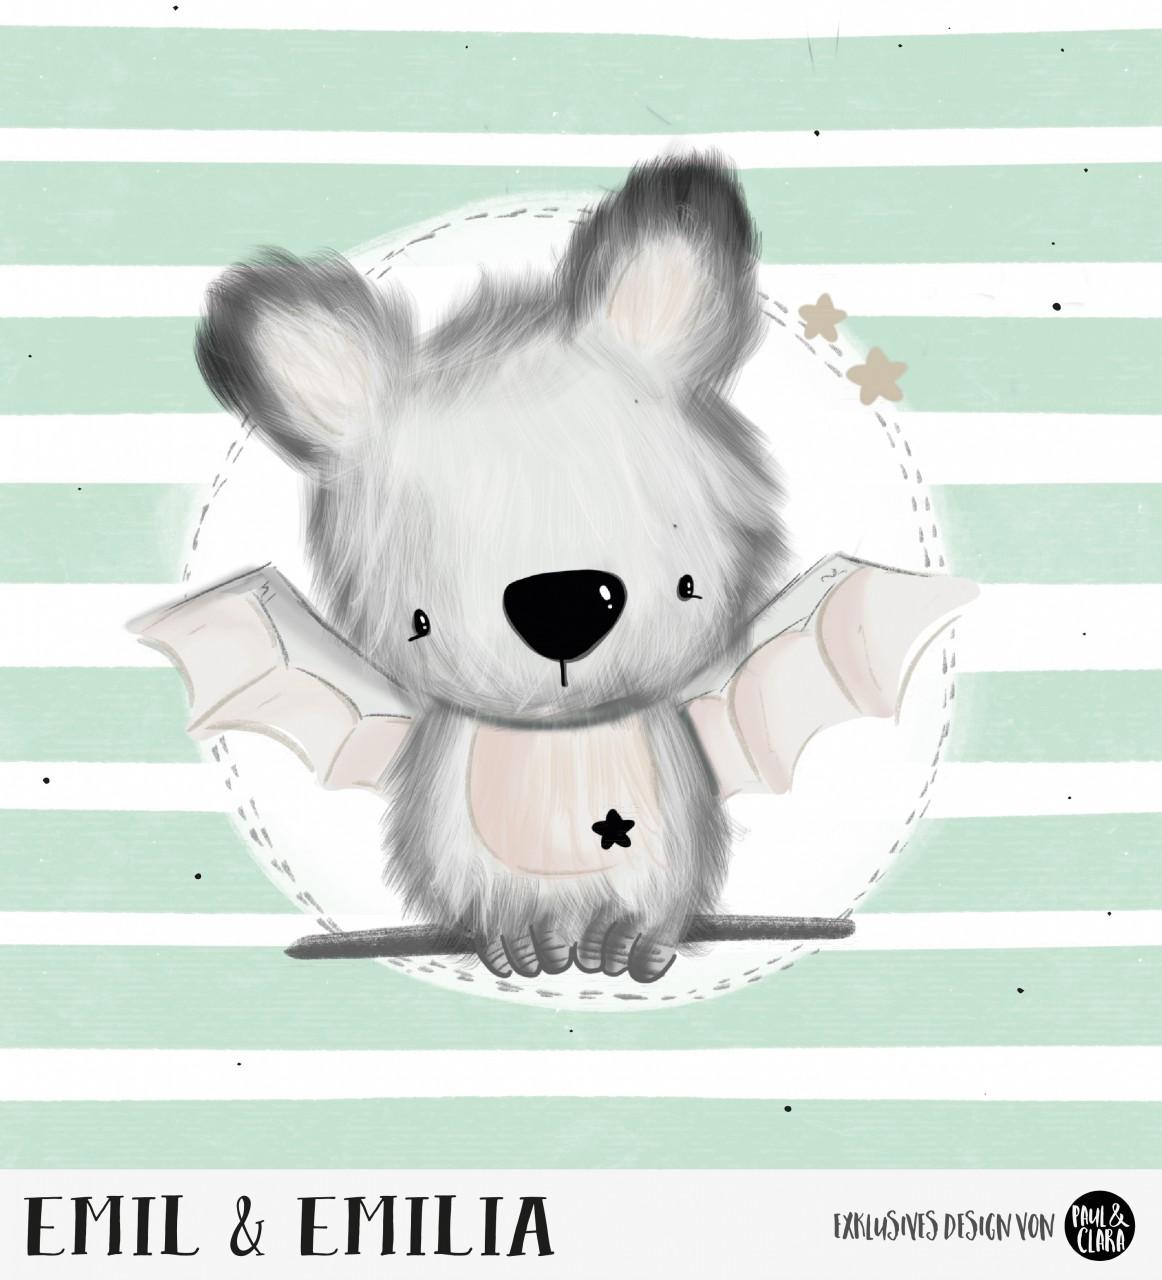 Emil & Emilia - Panel Mint 60 cm *Bio-Sommersweat*